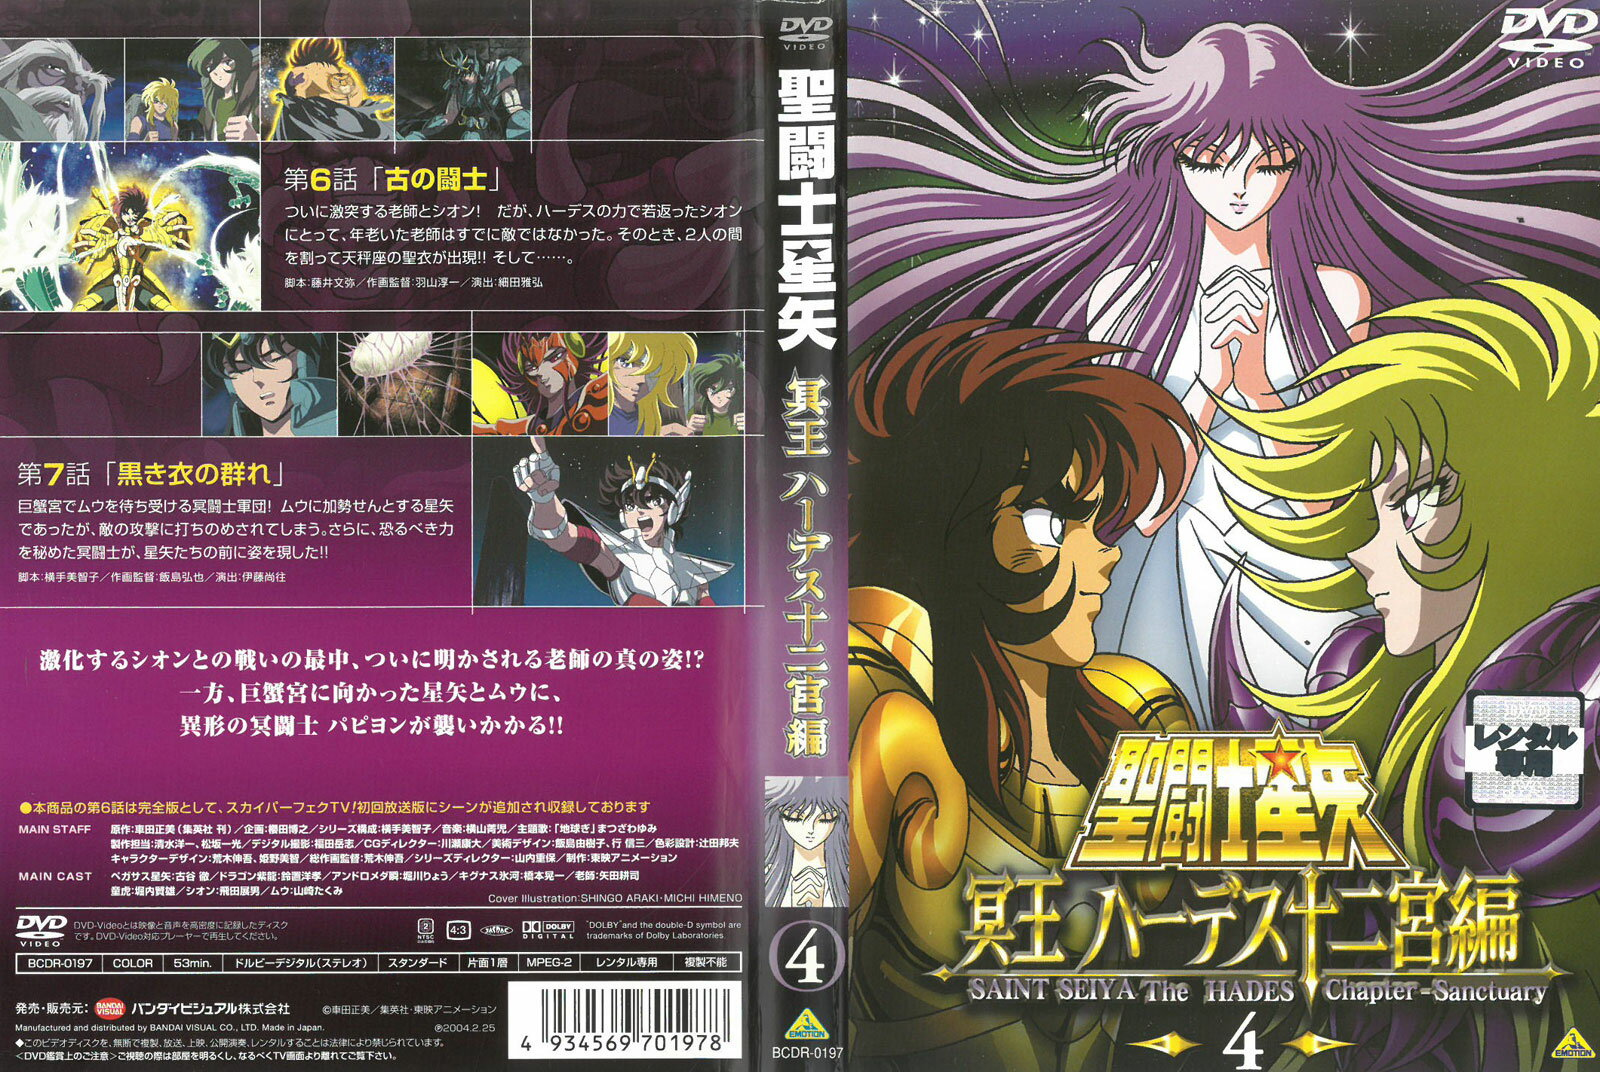 Knights Of The Zodiac dvd drh02265 Vol.4 DVD